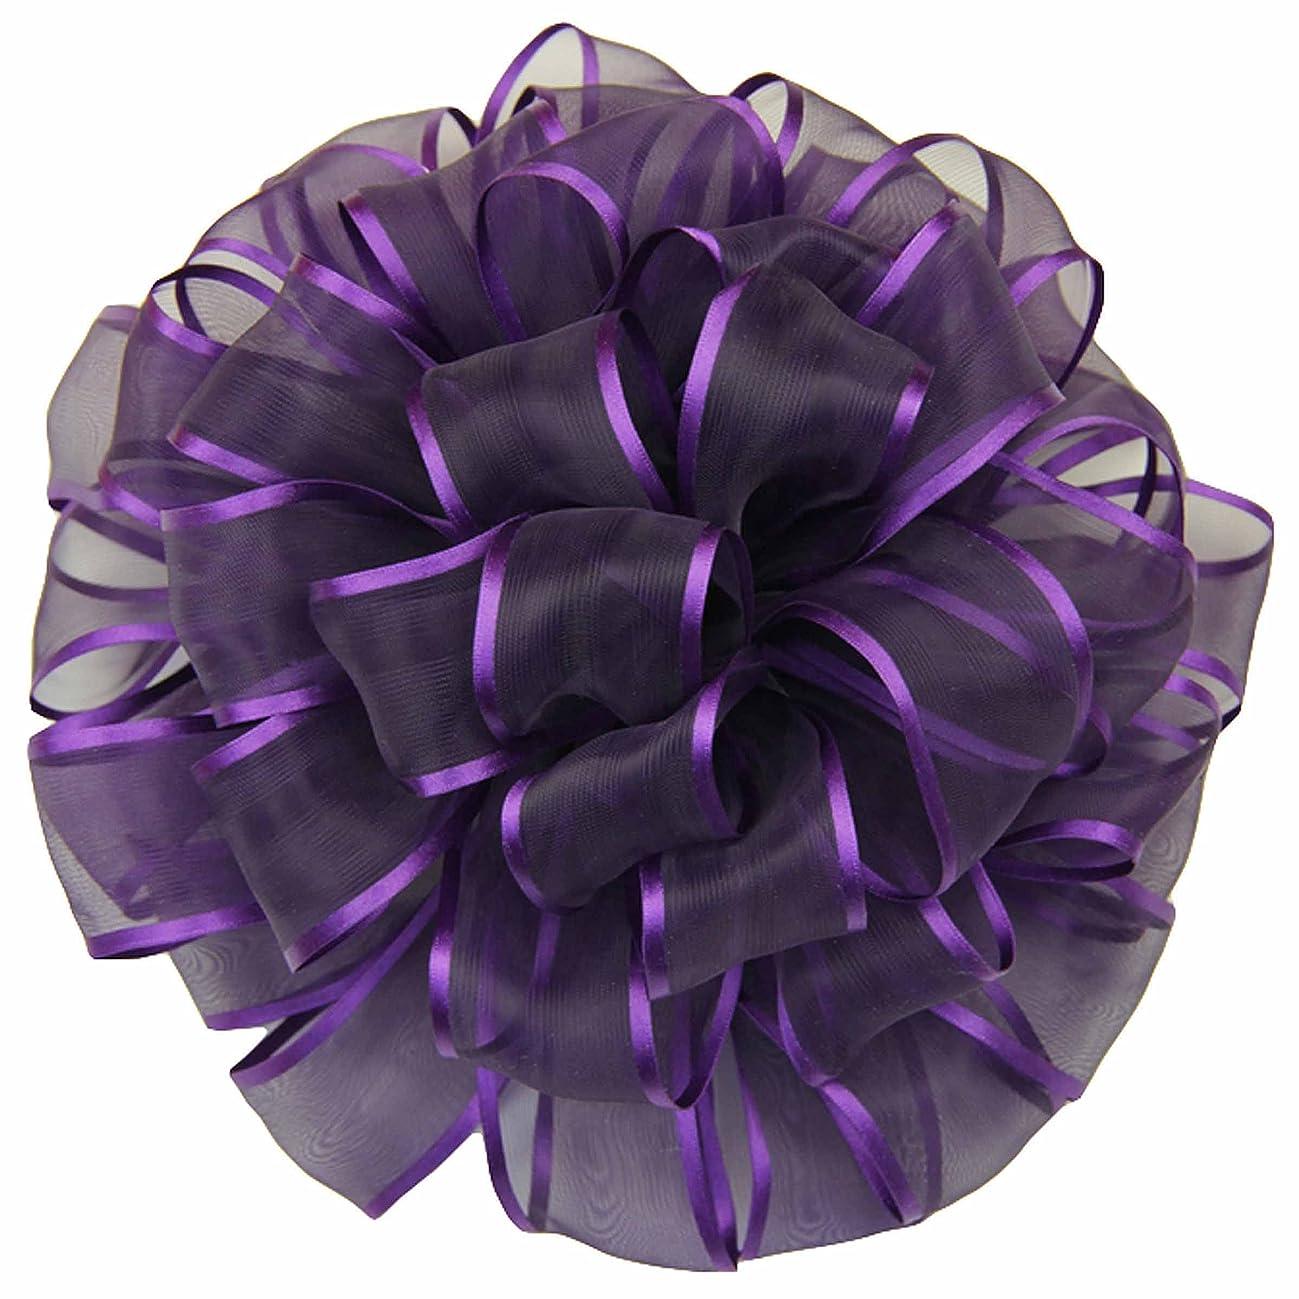 Offray Wired Edge Arabesque Craft Ribbon, 1 1/2-Inch x 9-Feet, Purple